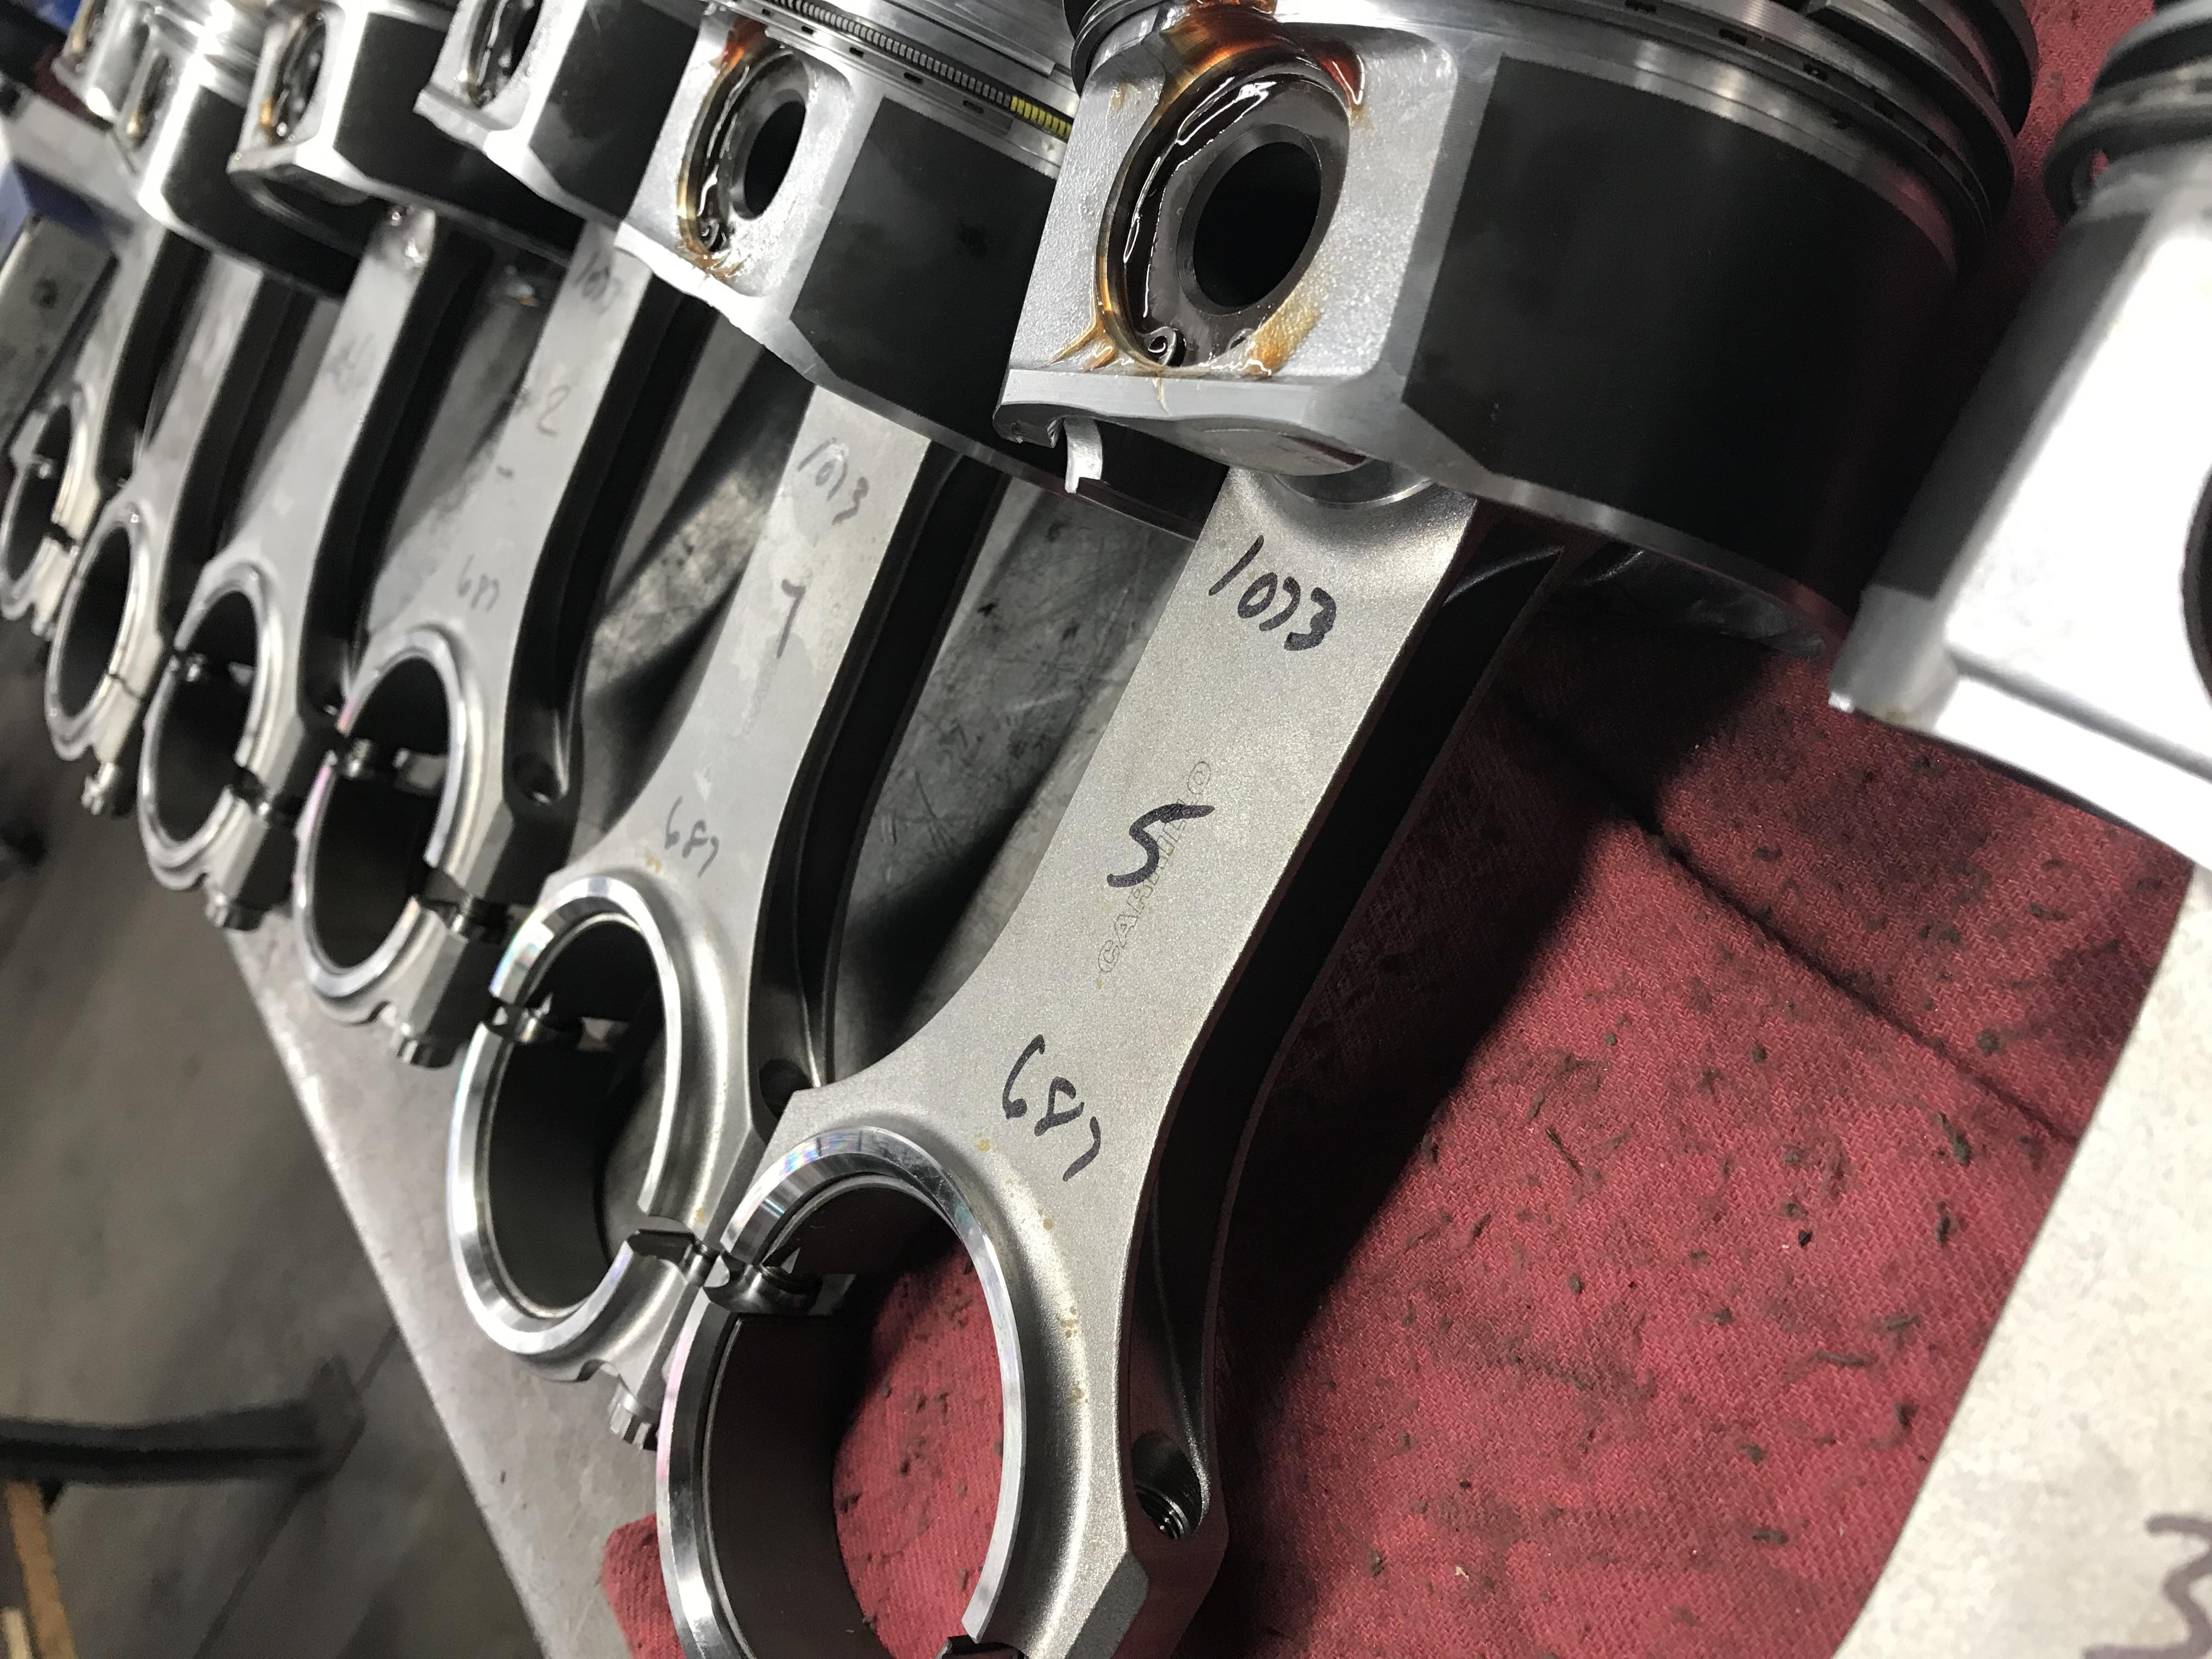 Duramax Diesel Rods